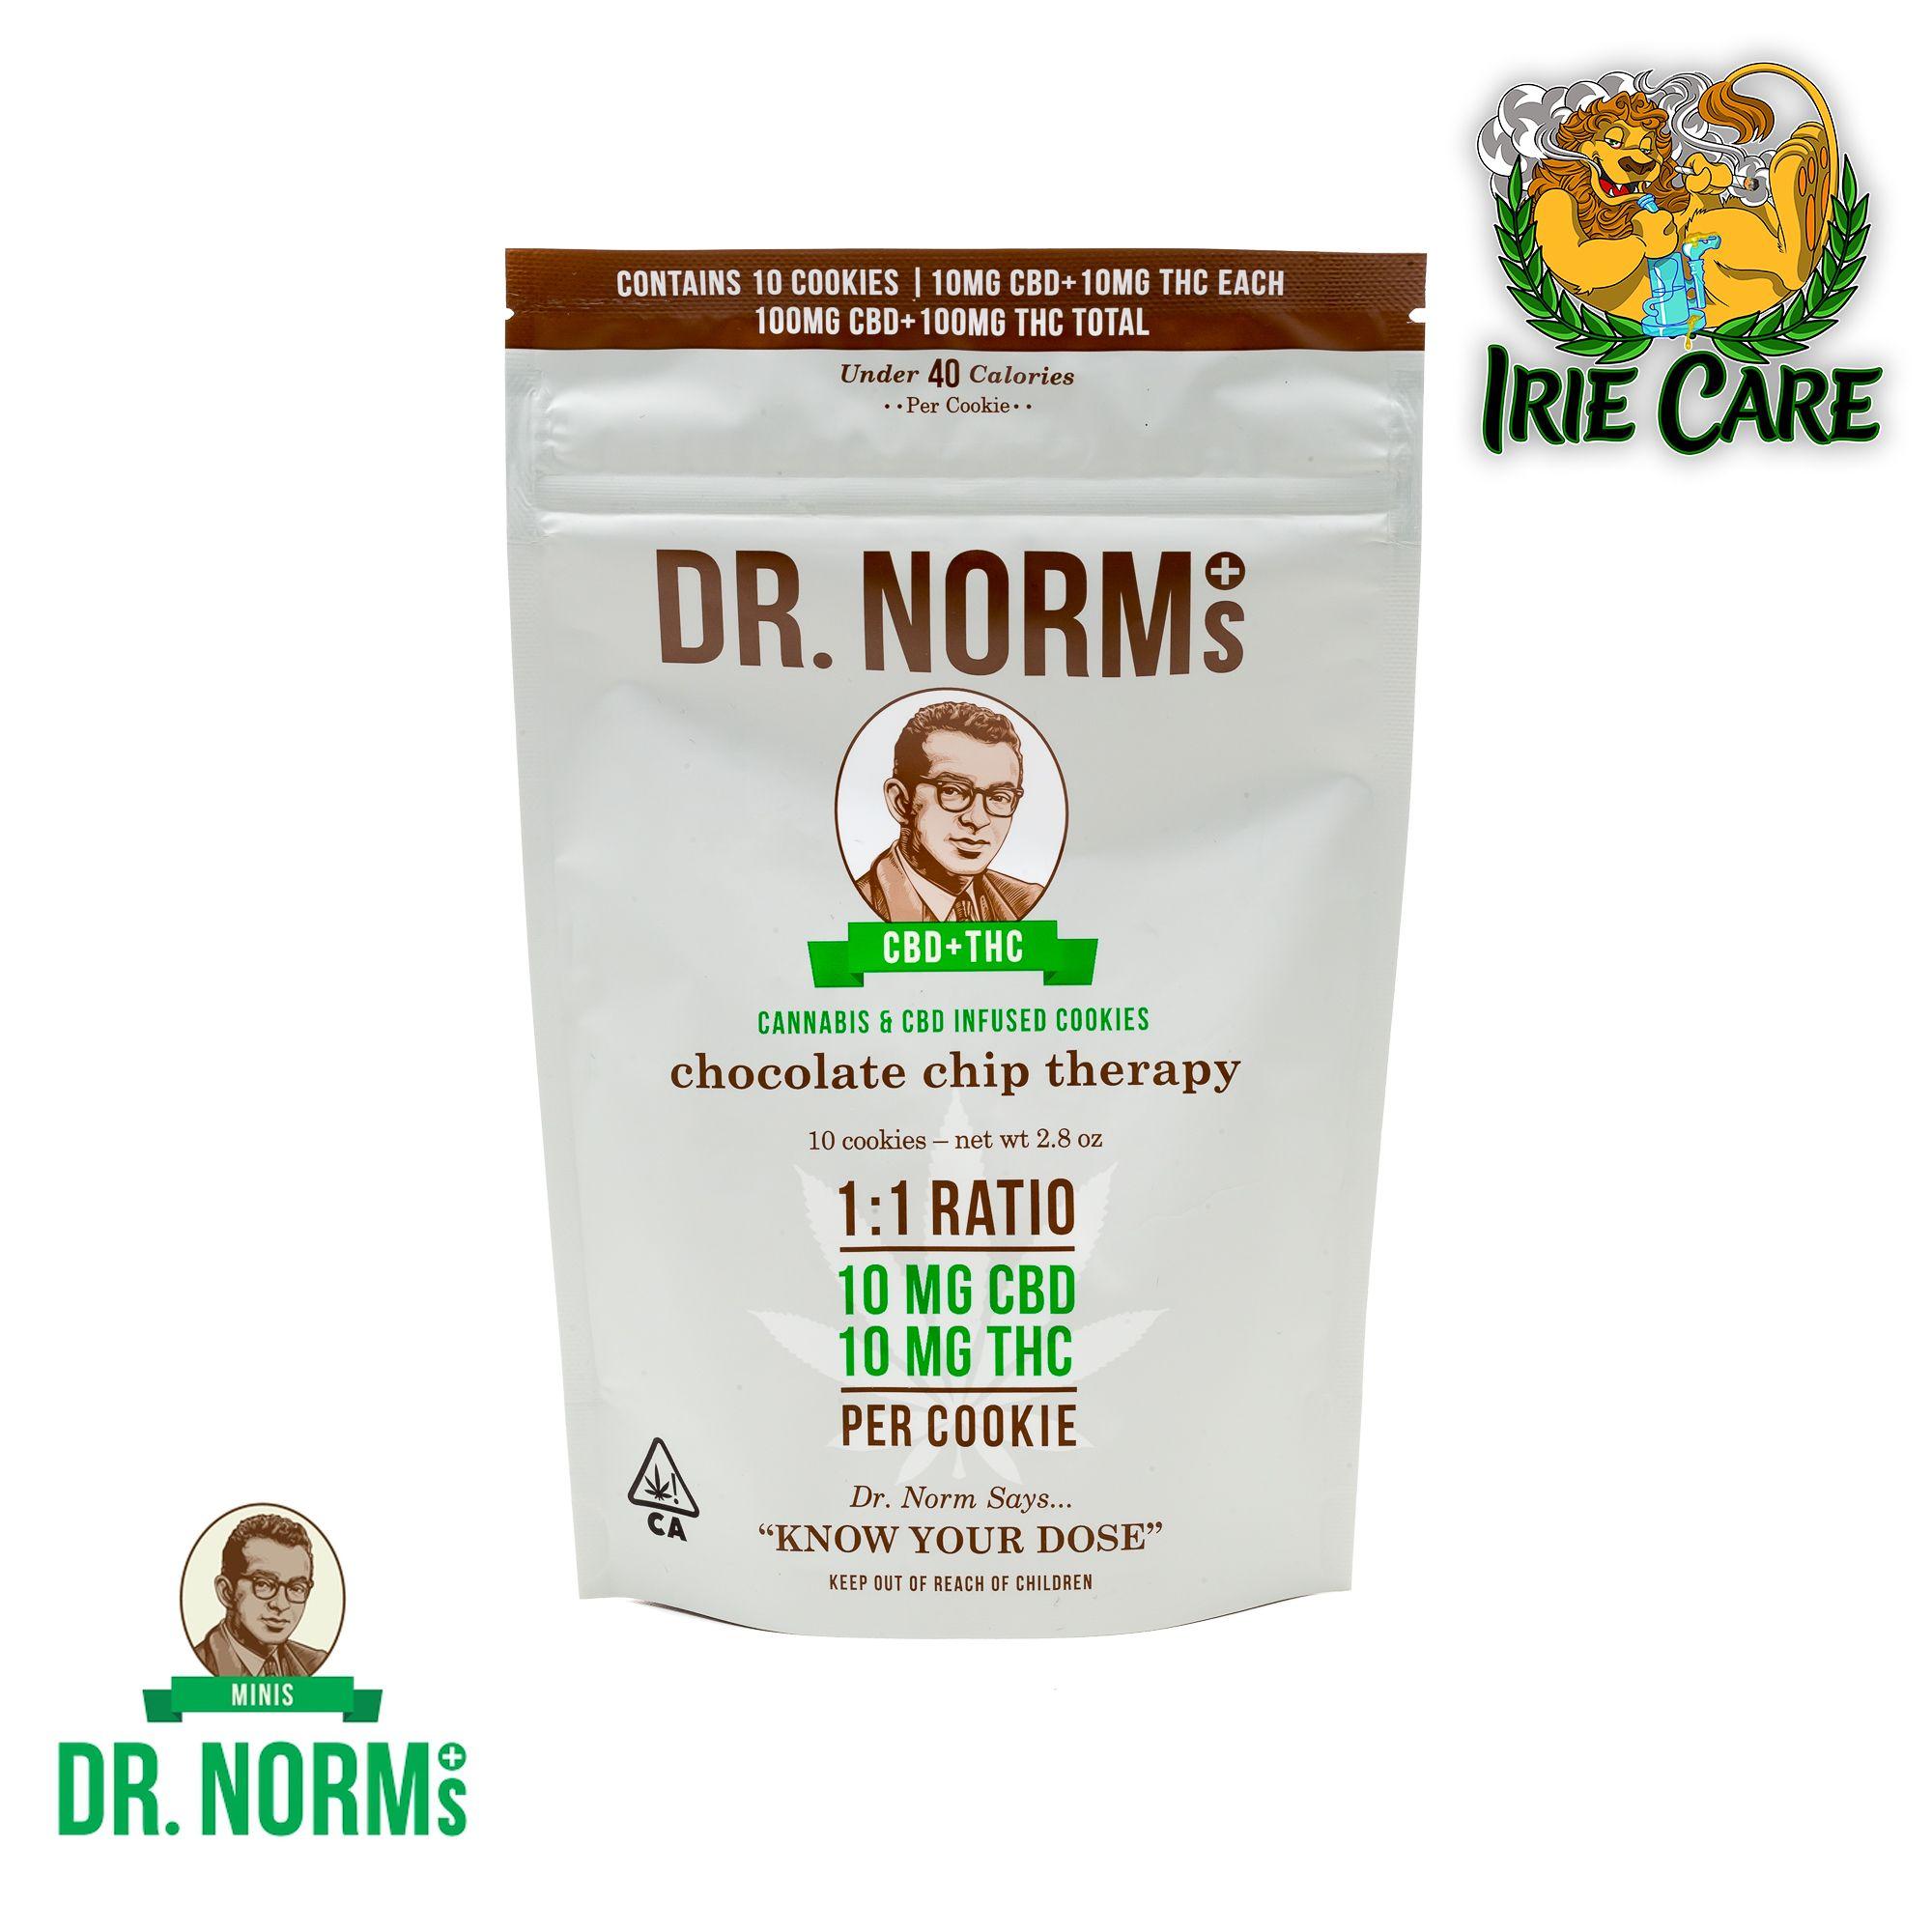 Dr. Norm's Chocolate Chip CBD Cookies (10 cookies - 100mg CBD/100mg THC)